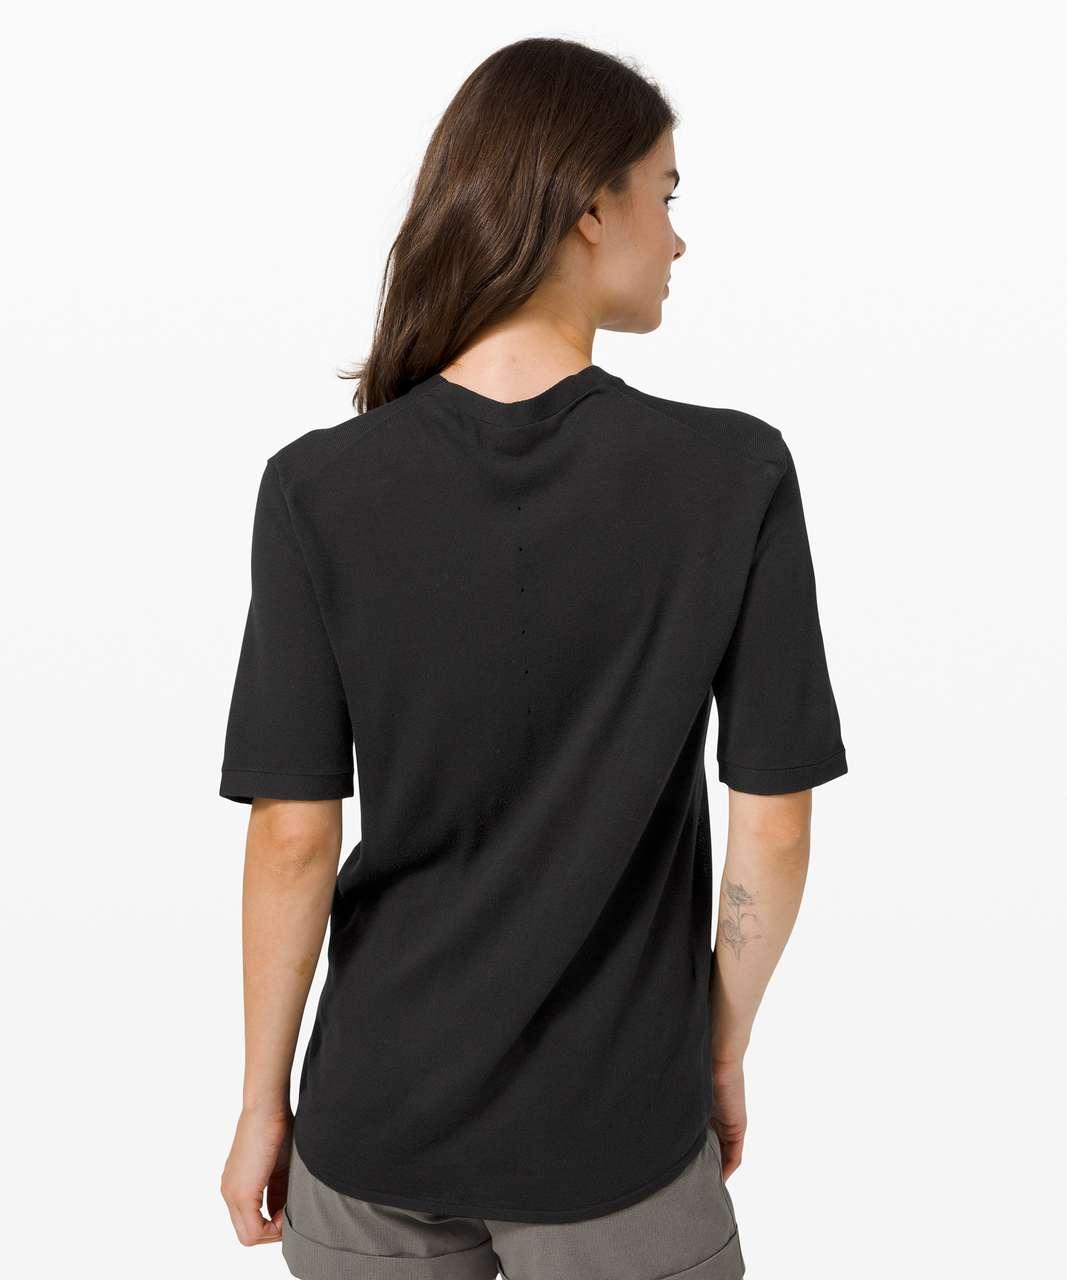 Lululemon Easy Days Short Sleeve - Black